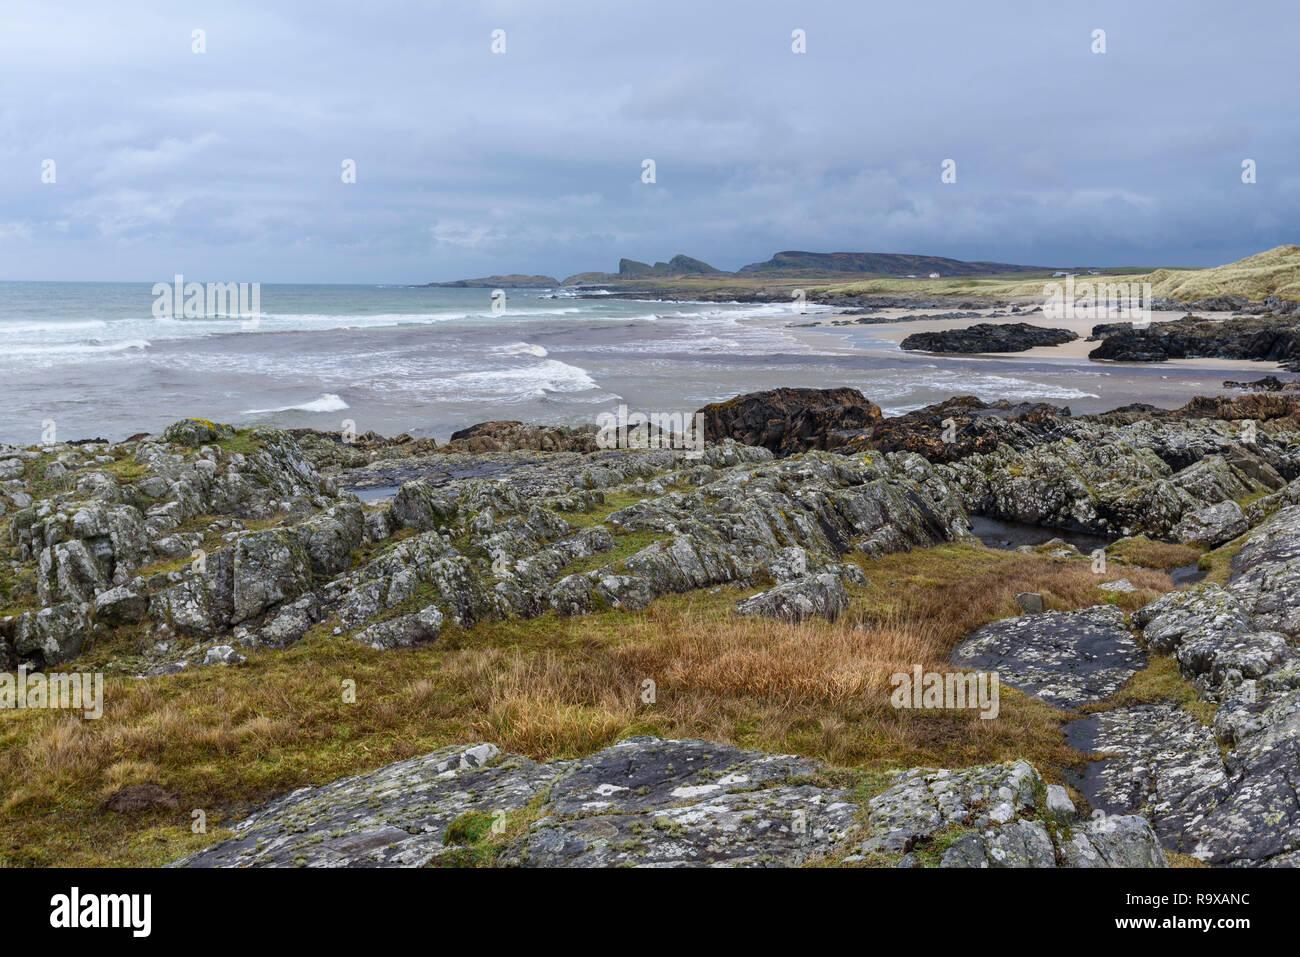 Rocky shore of Saligo Bay, Rhinns of Islay, Inner Hebrides, Argyll & Bute, Scotland - Stock Image